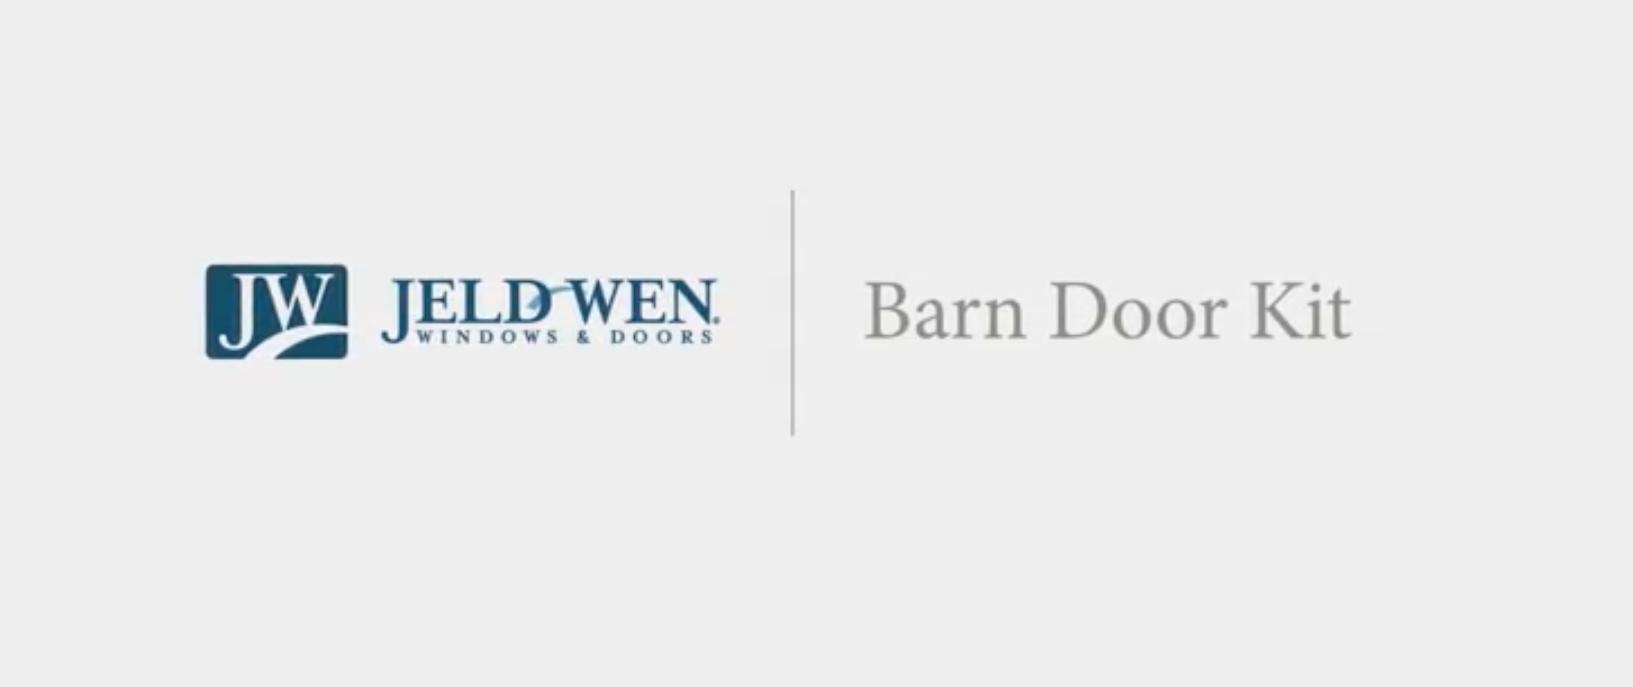 Barn Door Installation Tips from JELD-WEN